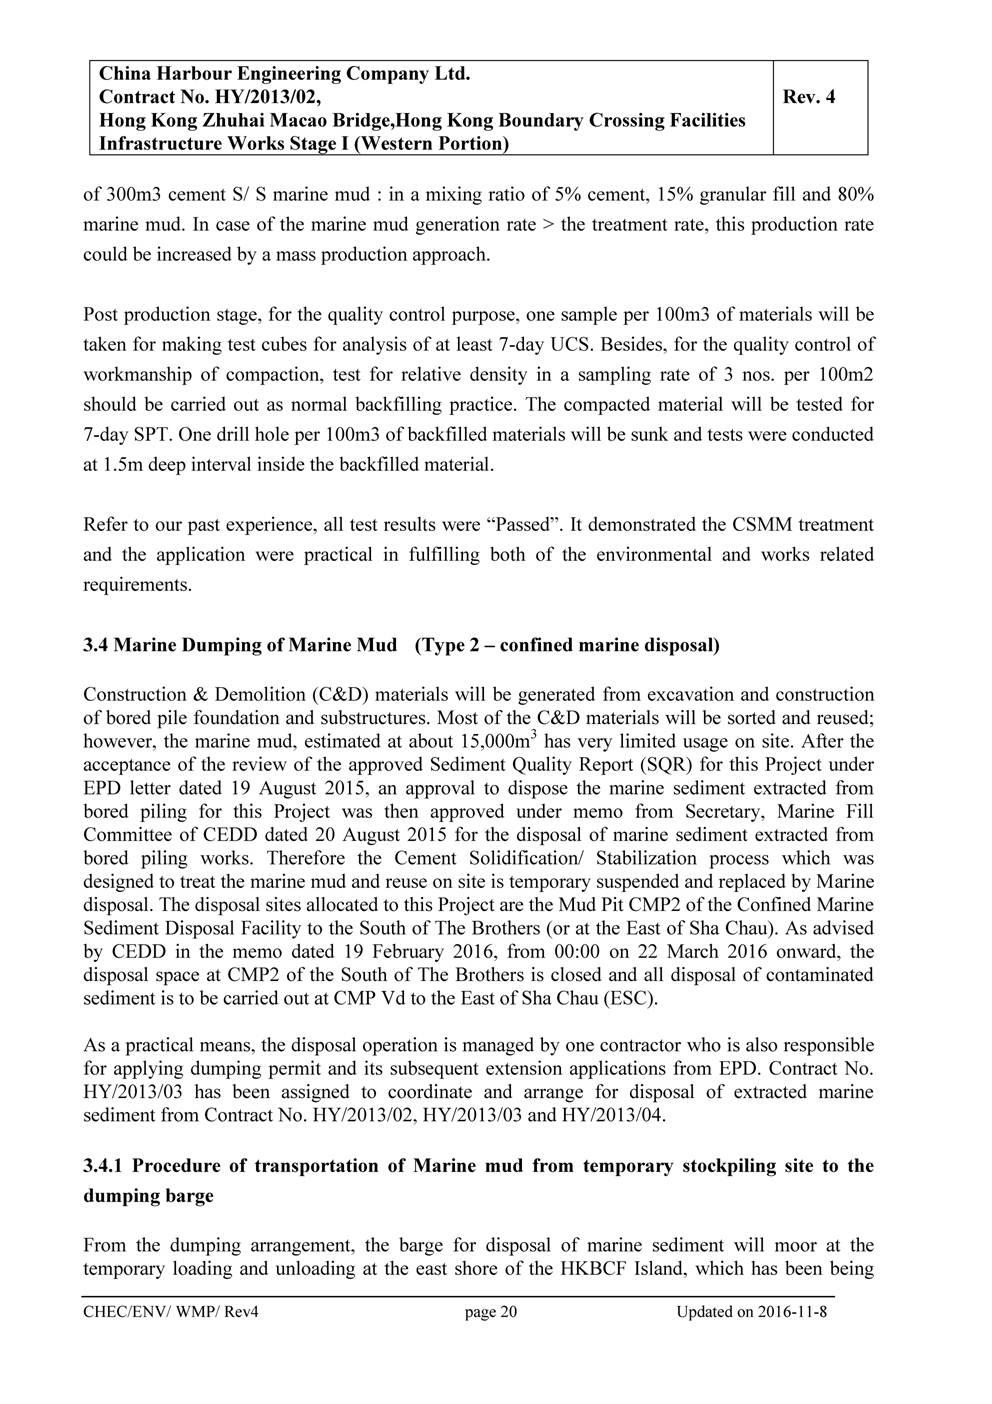 Waste Management Plan (Rev 4)_頁面_01 png Waste